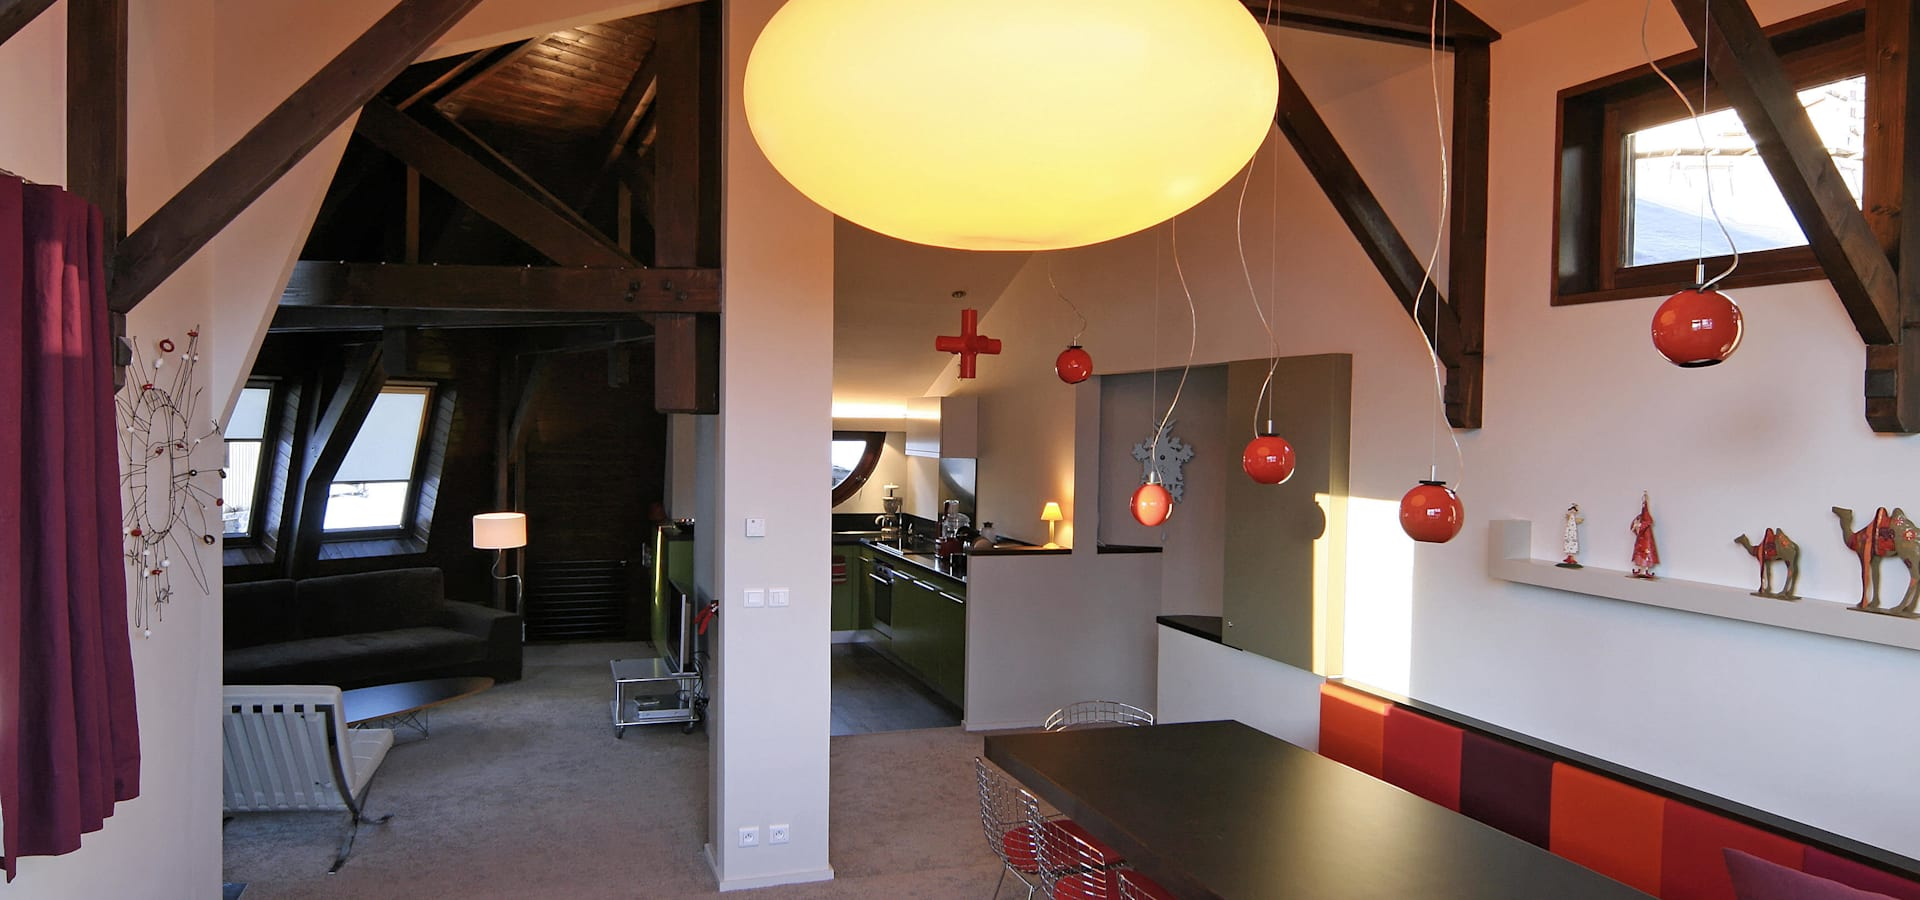 Florine Burger Architecte